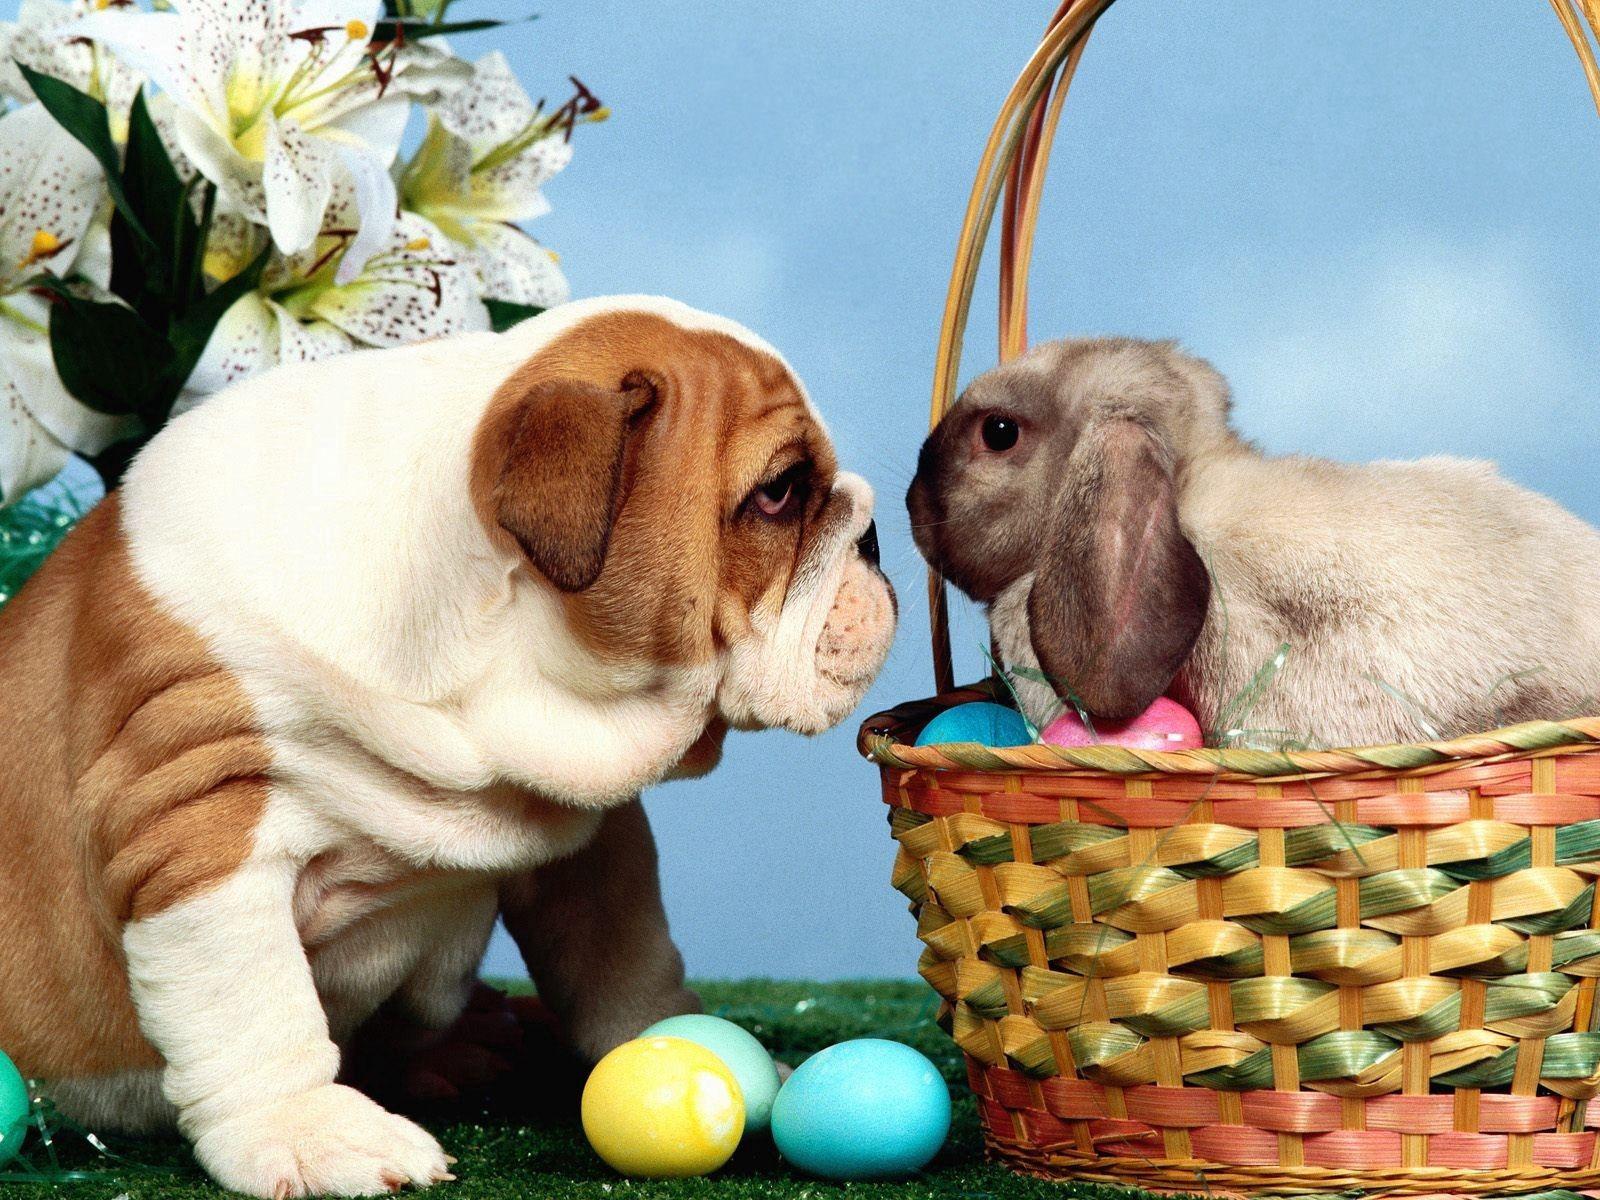 102771 descargar fondo de pantalla Animales, Perro, Conejo, Cesta, Canasta, Pascua, Huevos: protectores de pantalla e imágenes gratis